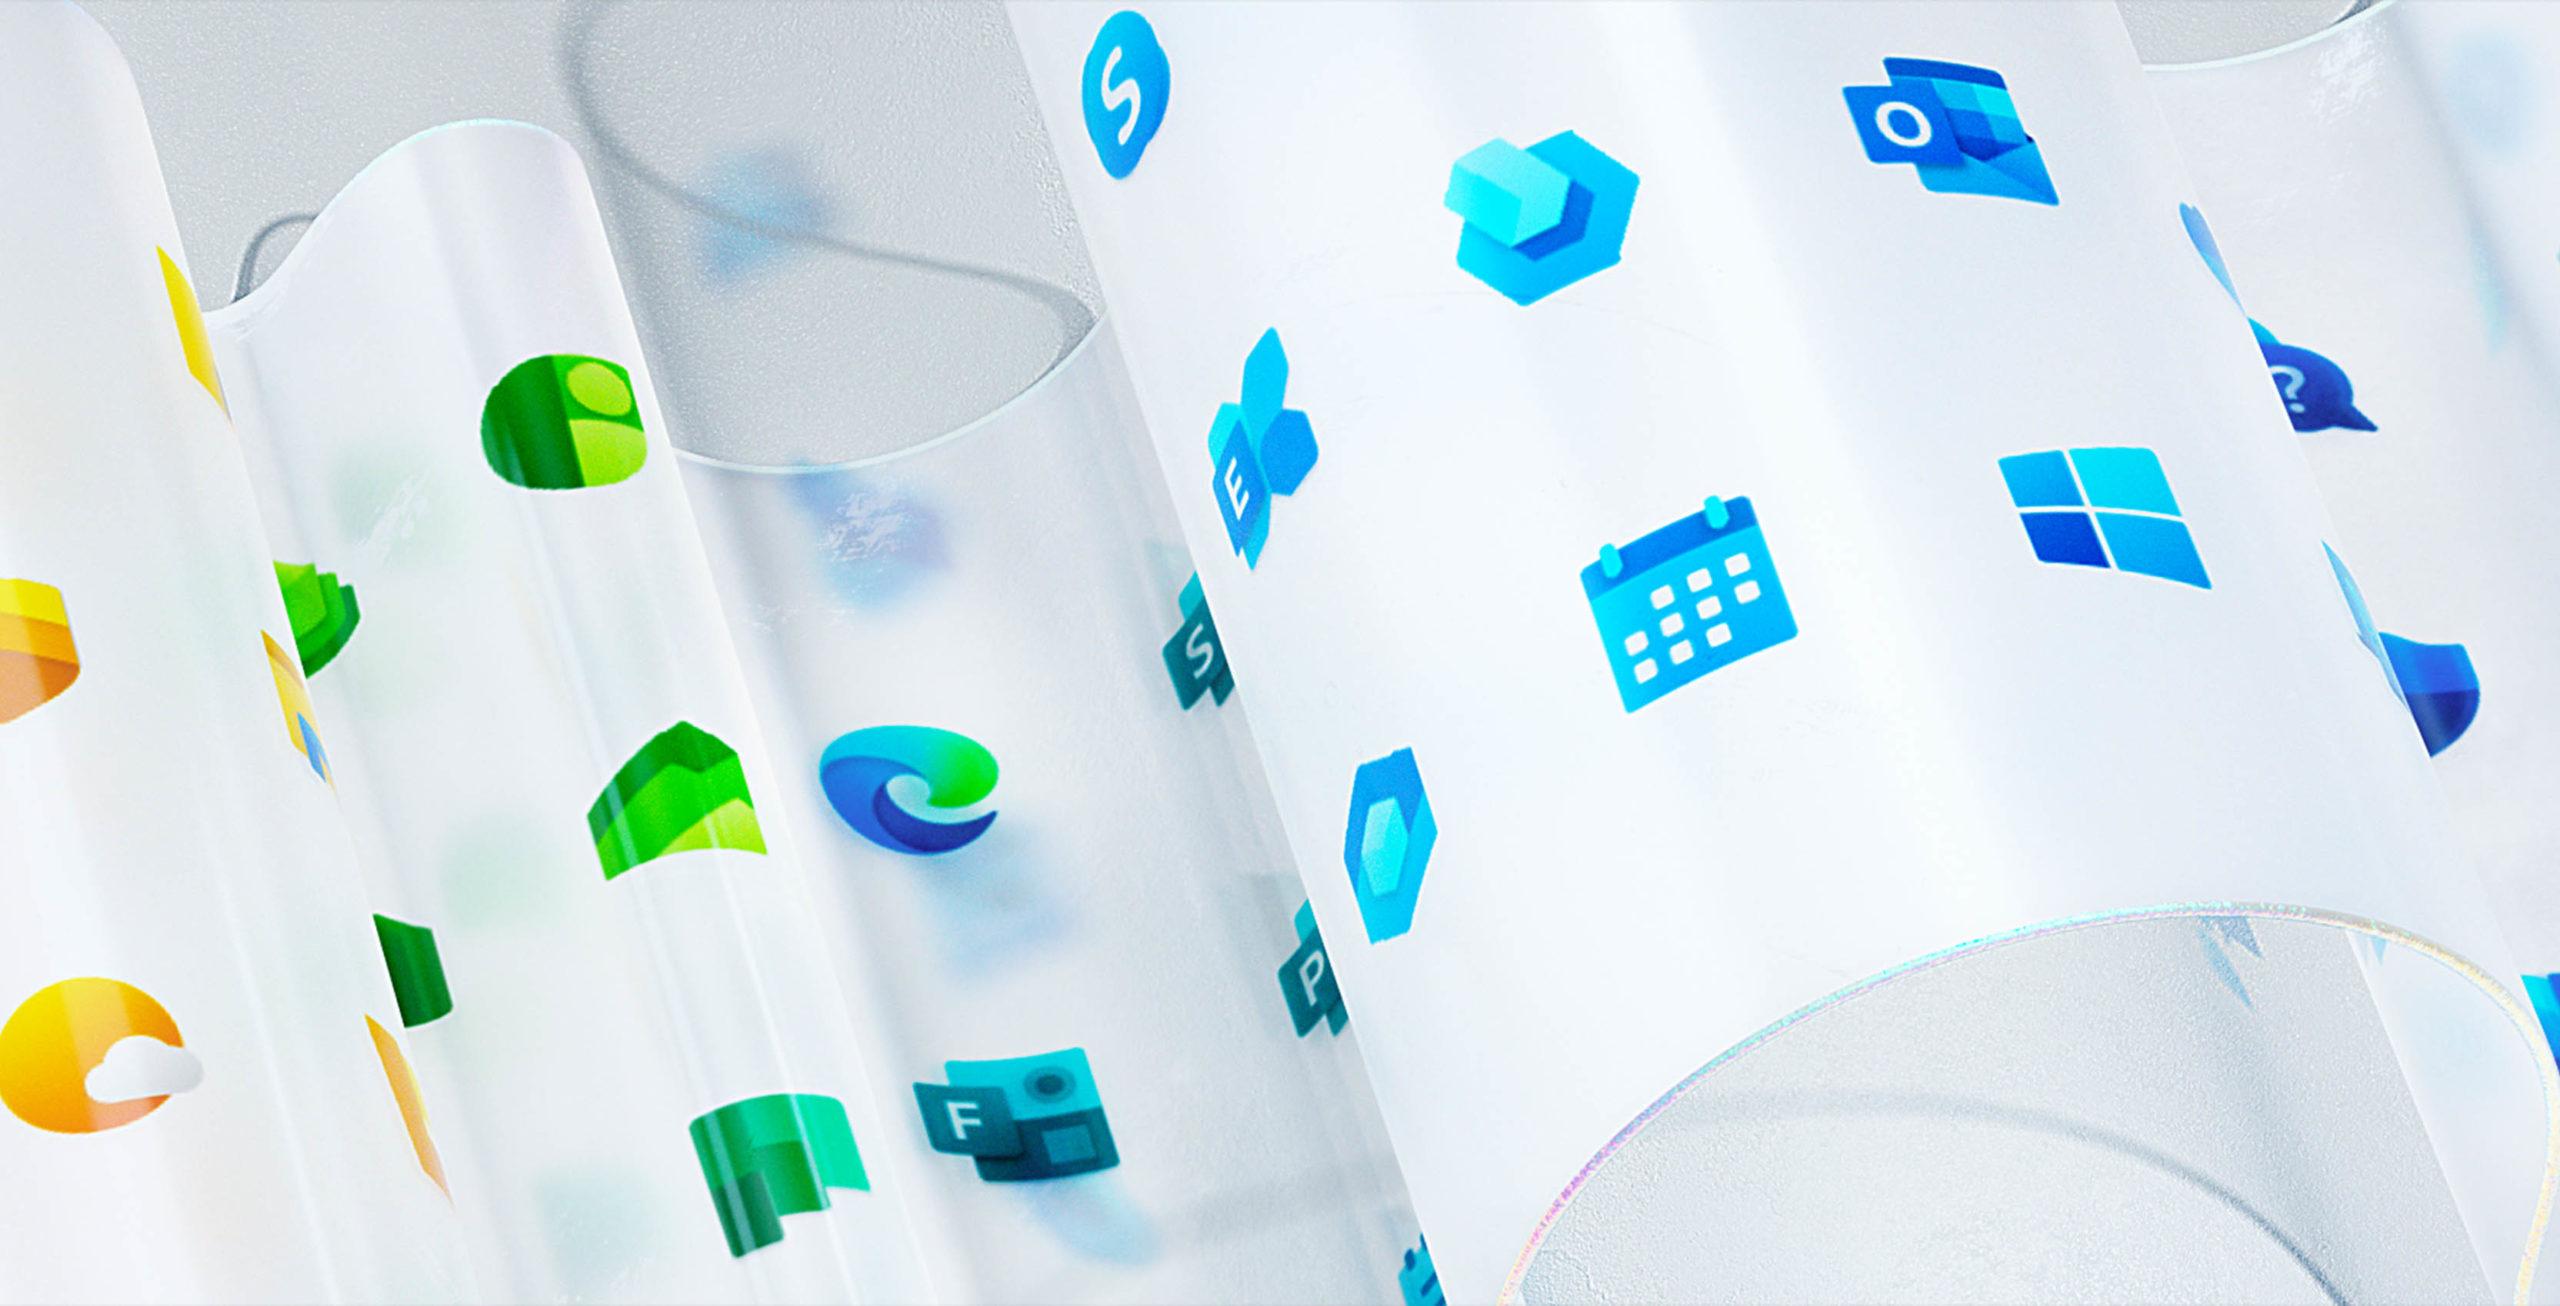 New Microsoft Windows icons